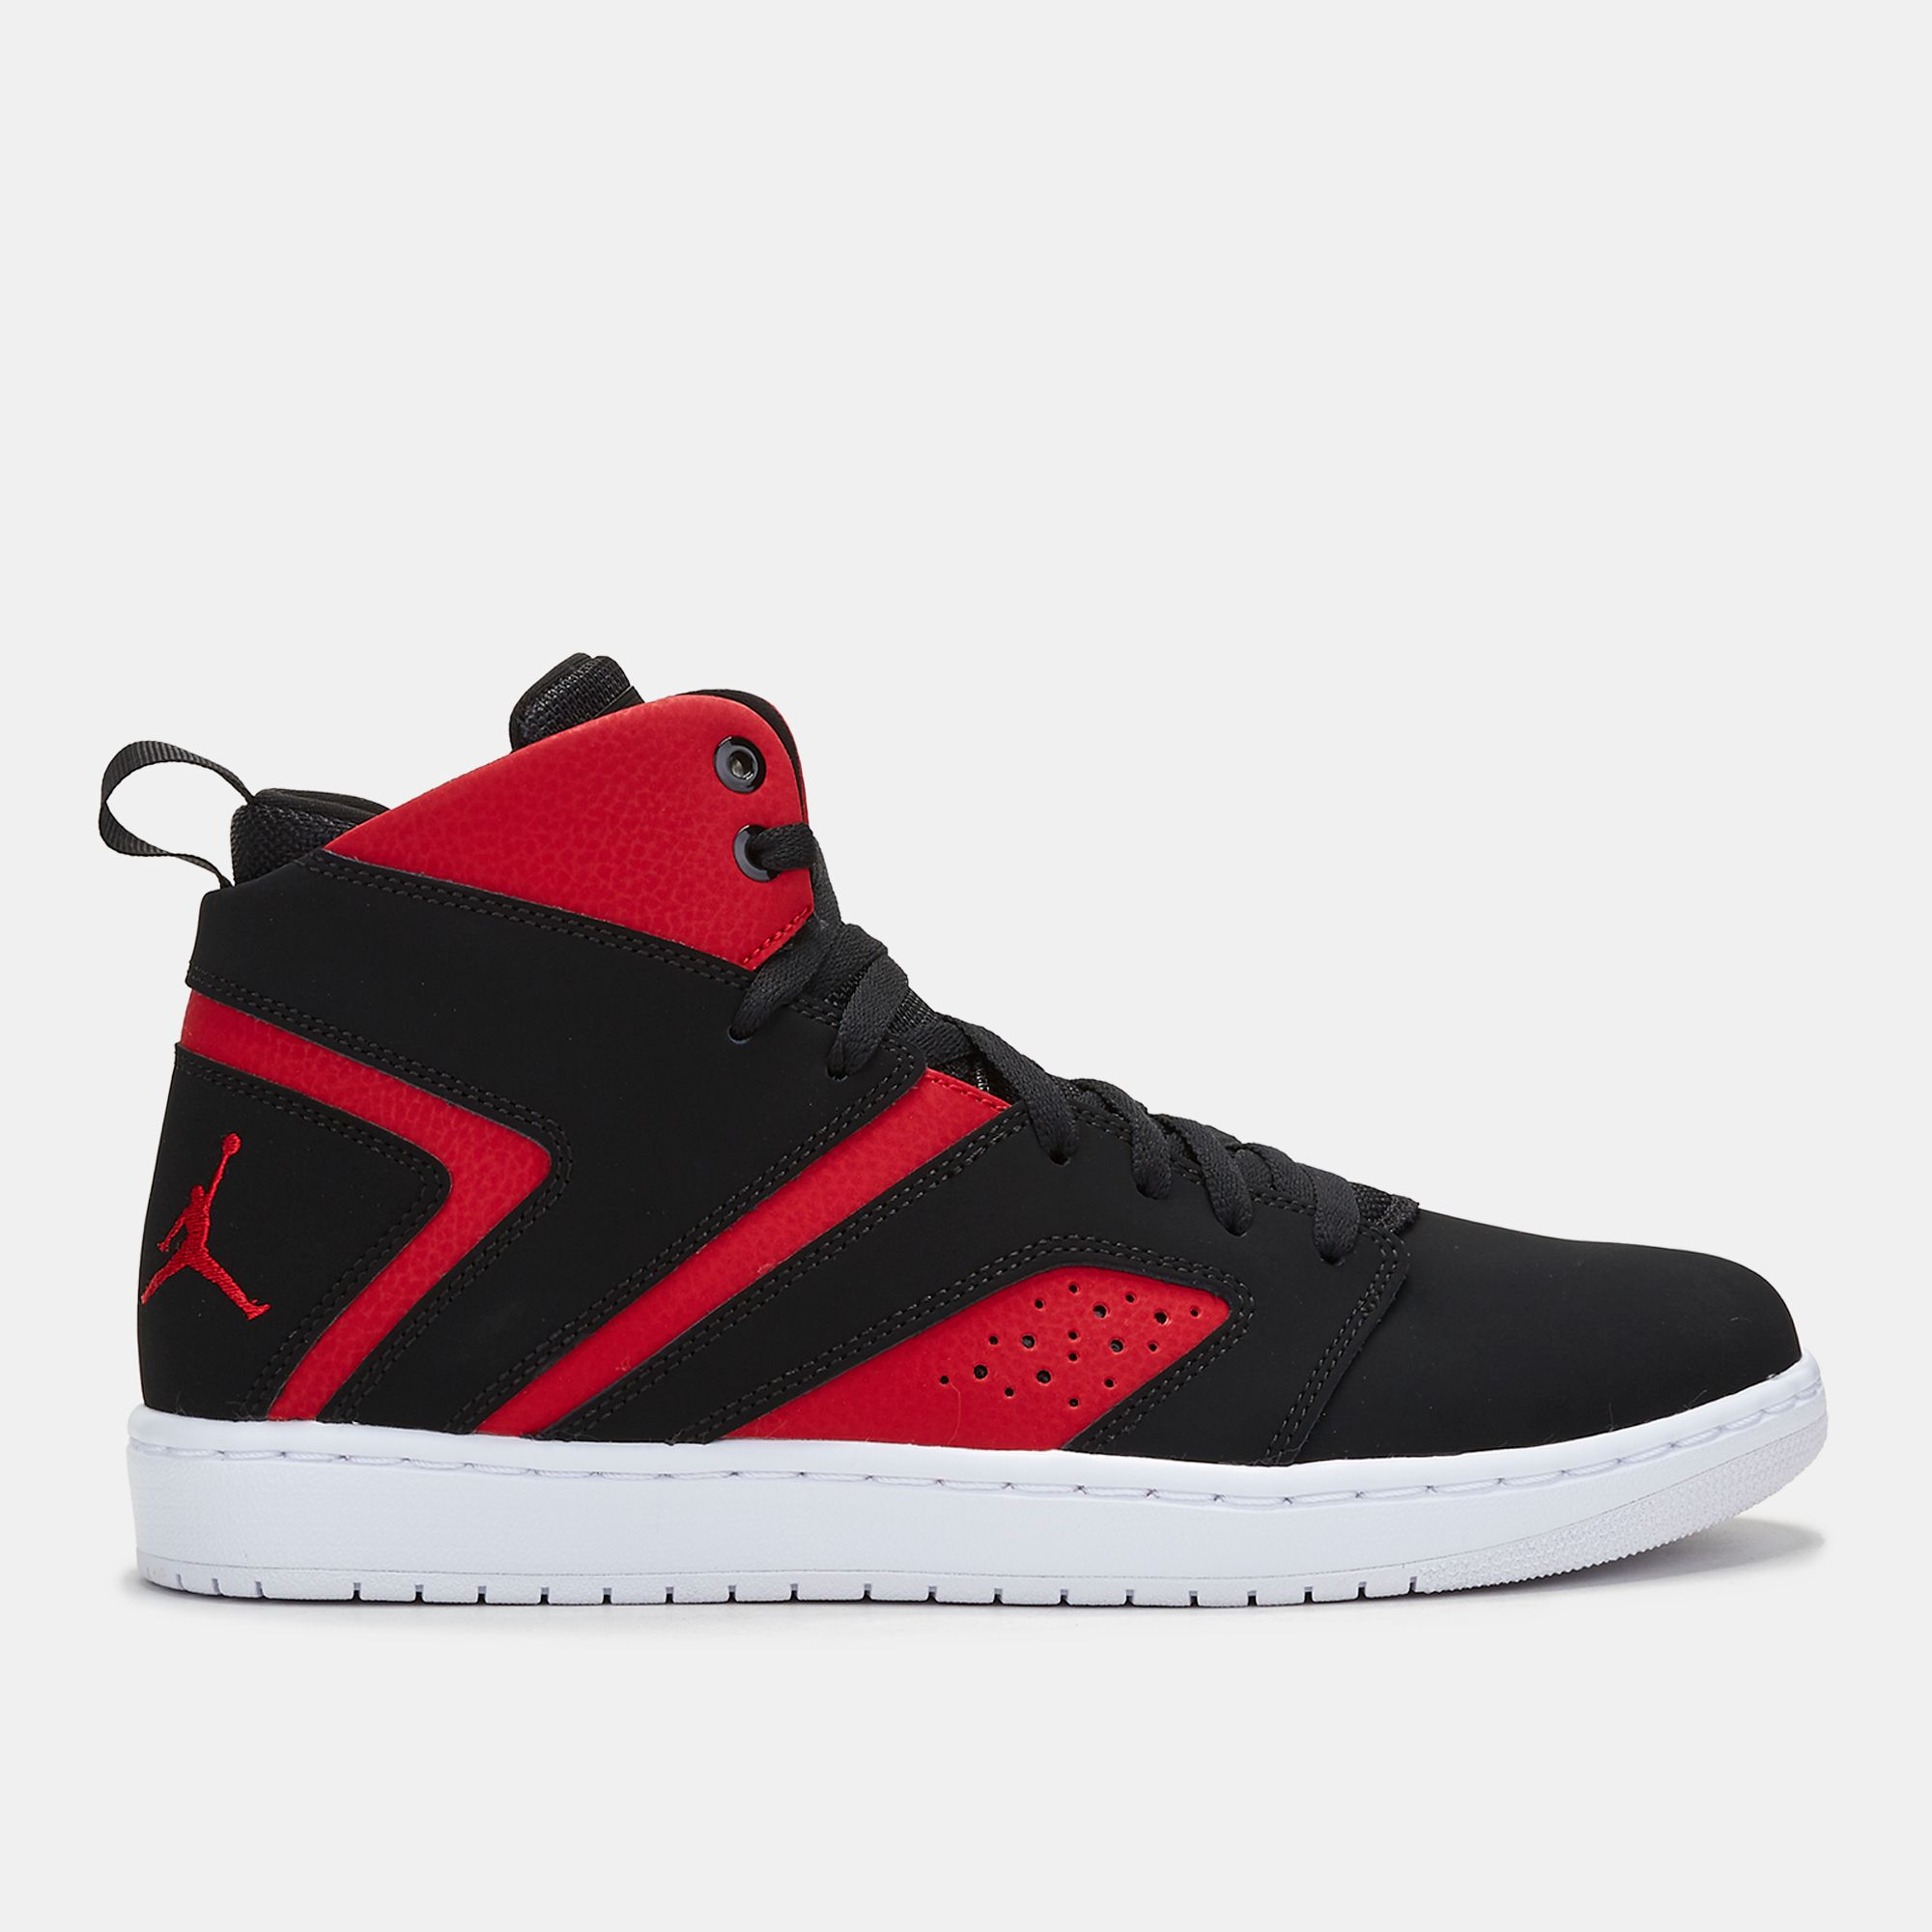 Shop Black Nike Jordan Flight Legend Basketball Shoe for Mens by ... 15508d6de